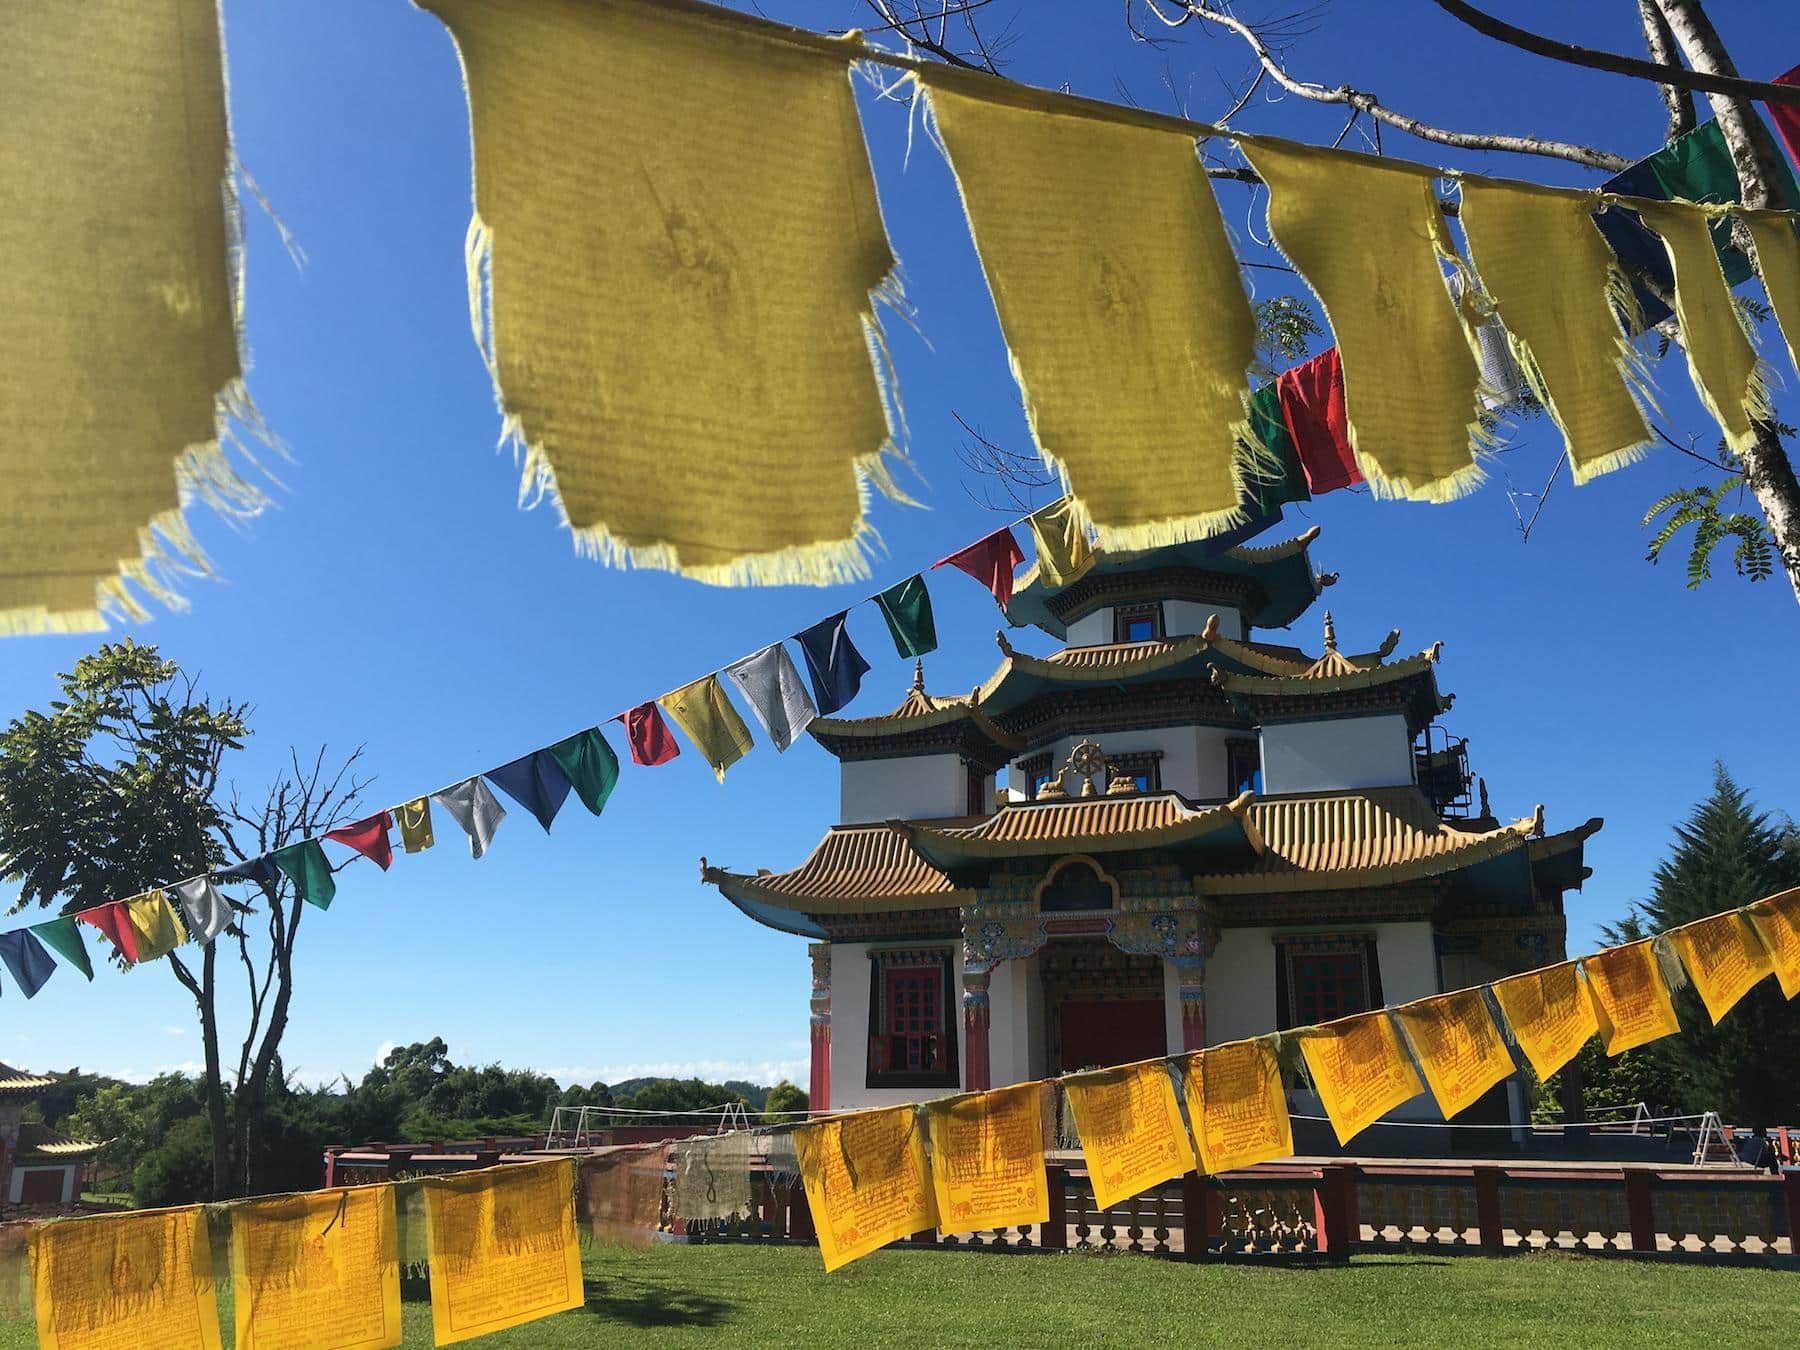 templo budista no brasil khadro ling terra pura destacada